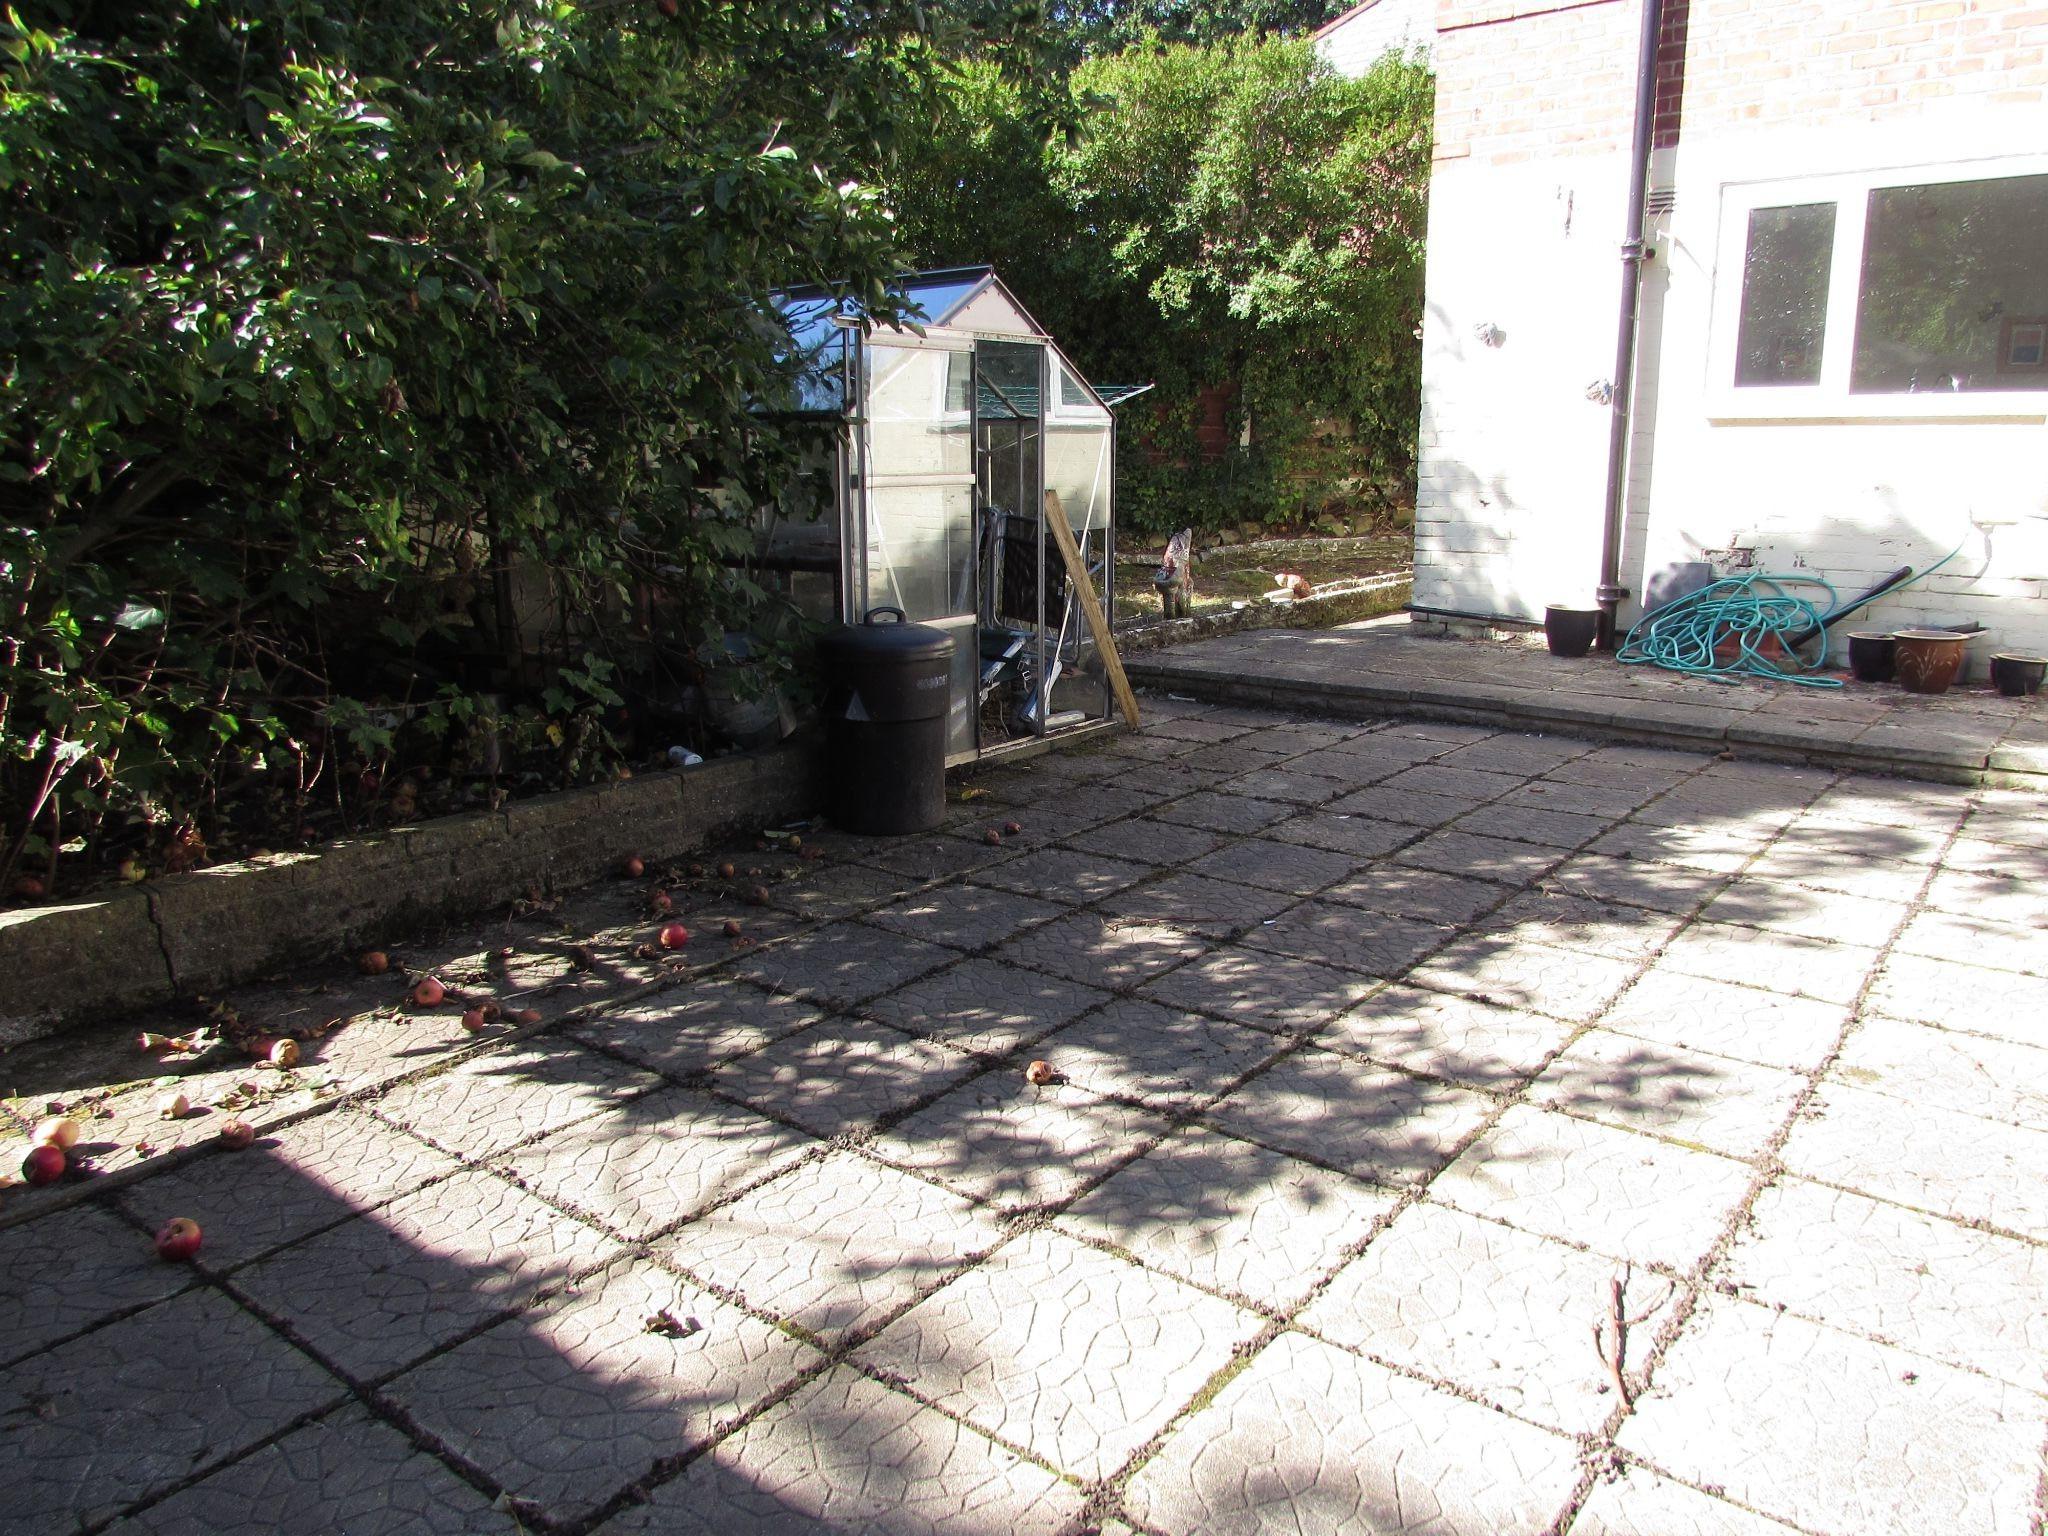 3 Bedroom Semi-detached House For Sale - Back garden